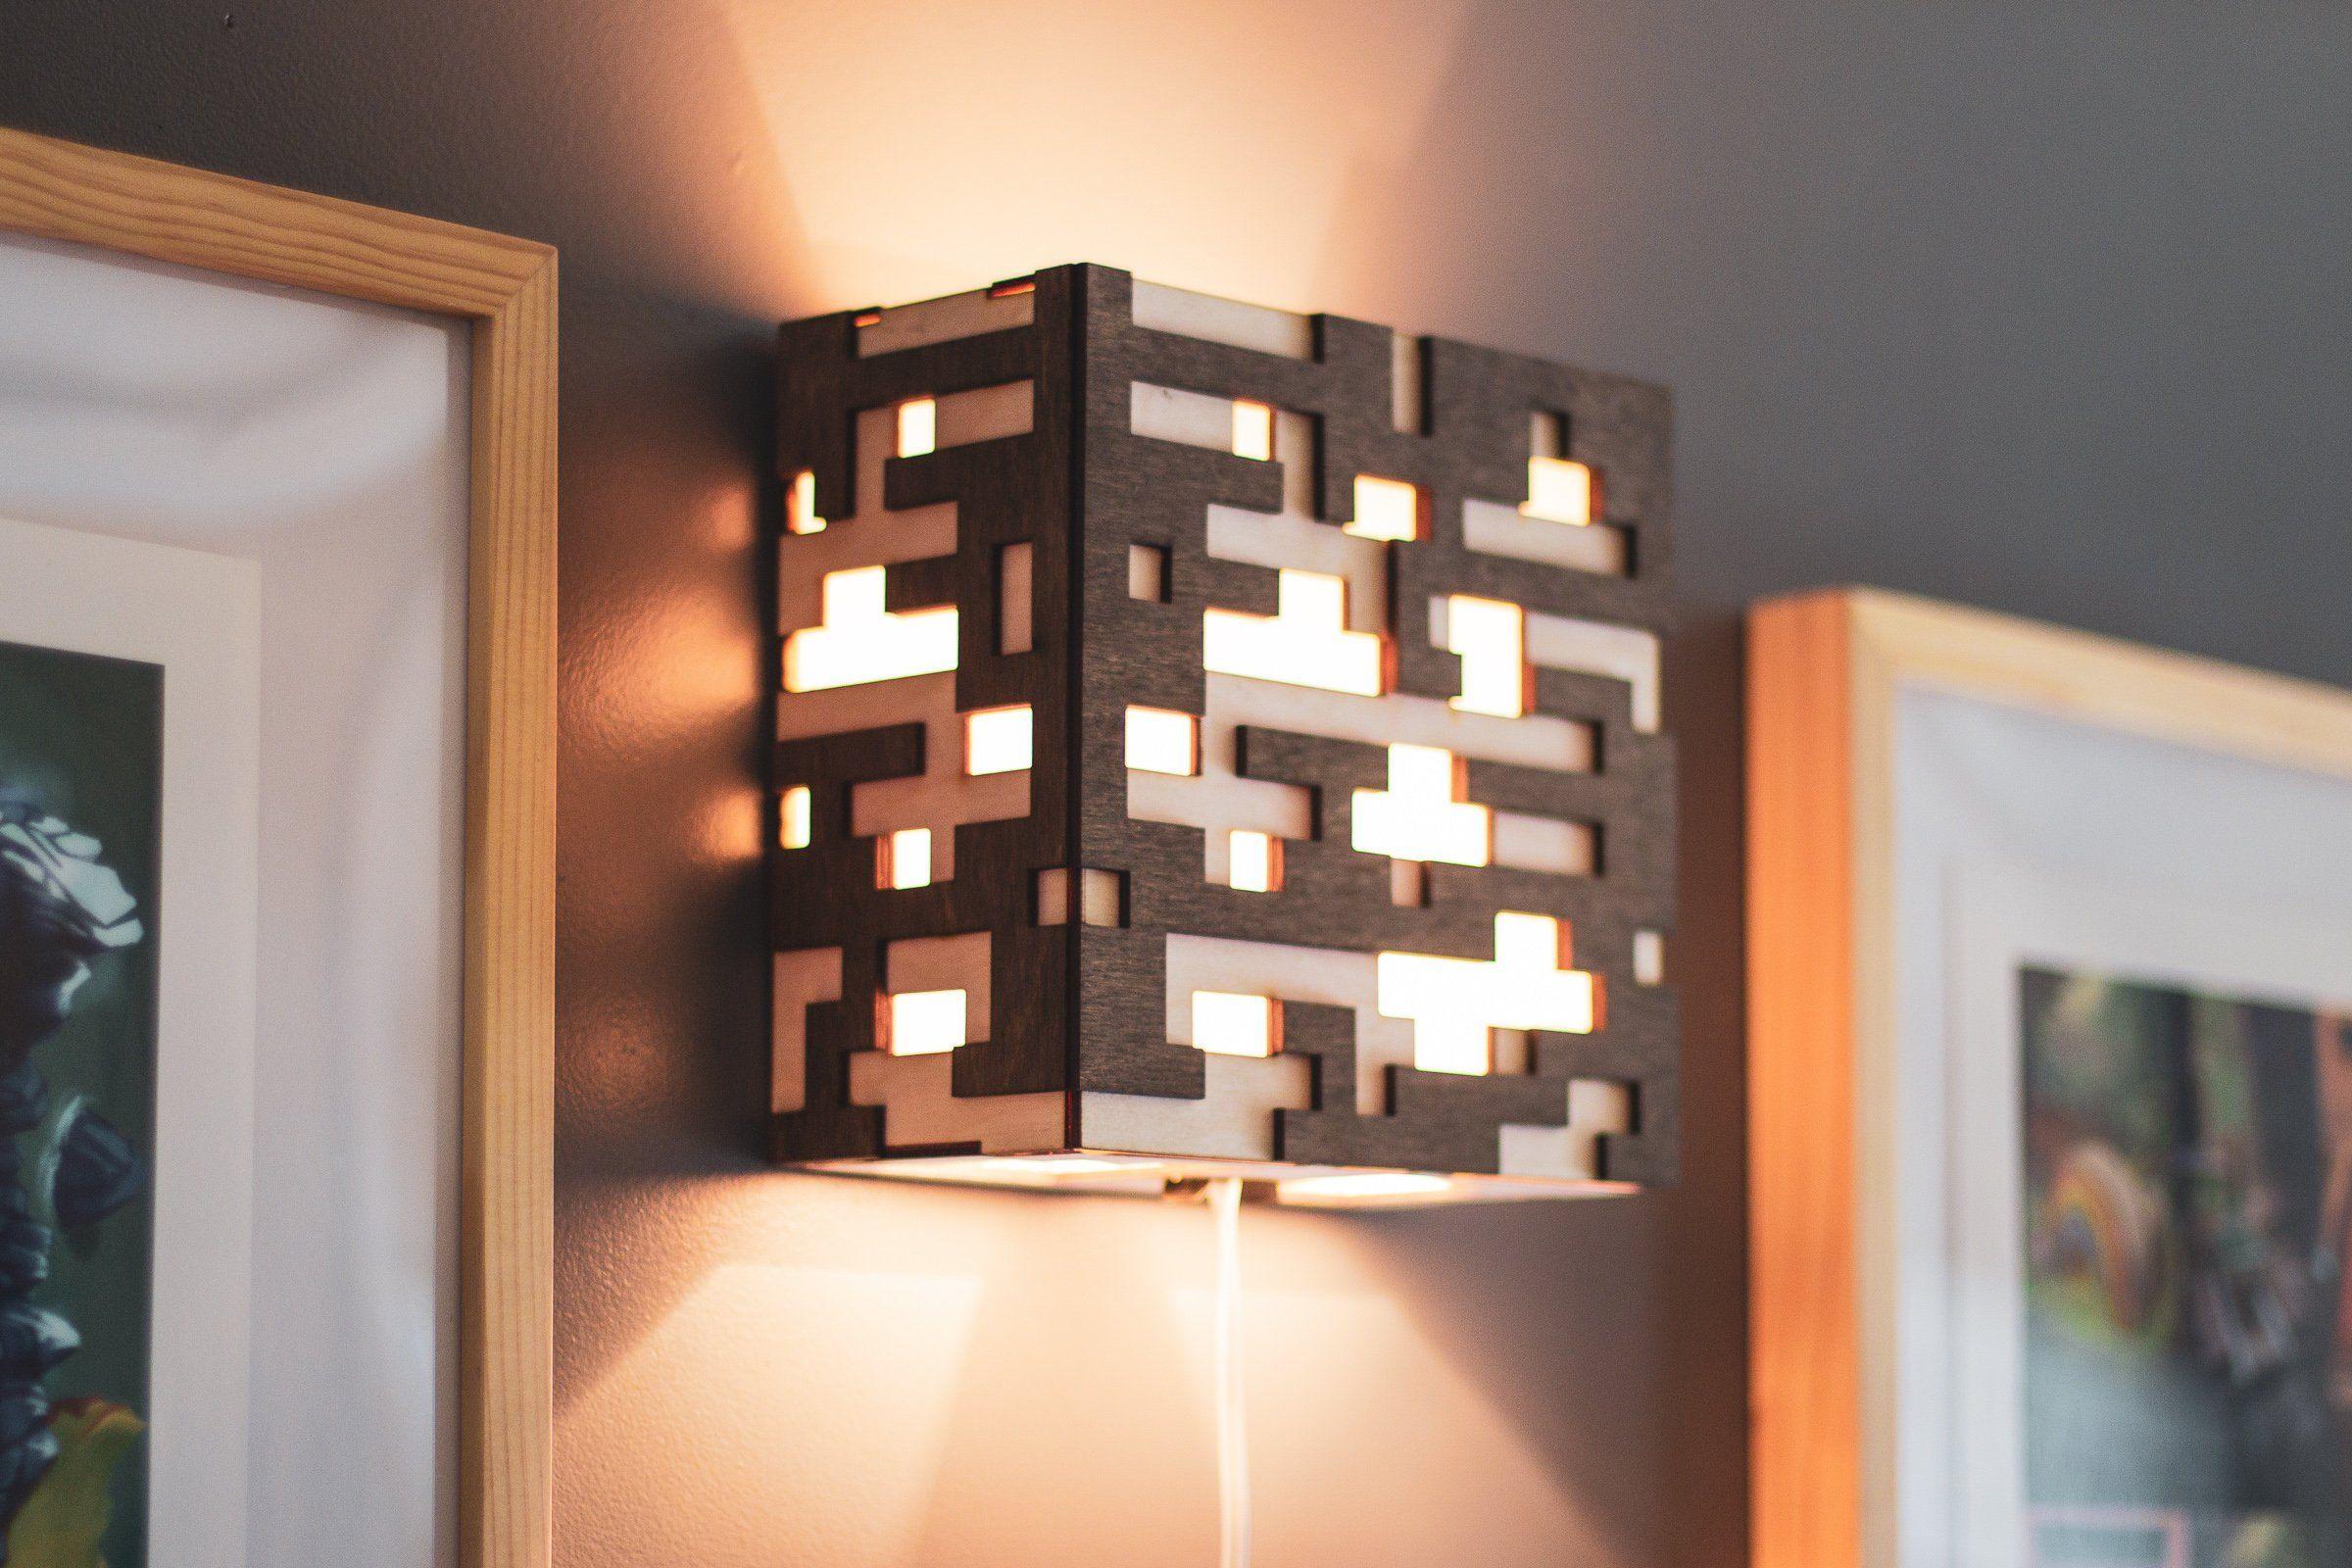 Minecraft Ore Lamp Etsy Minecraft Room Decor Minecraft Bedroom Decor Minecraft Room